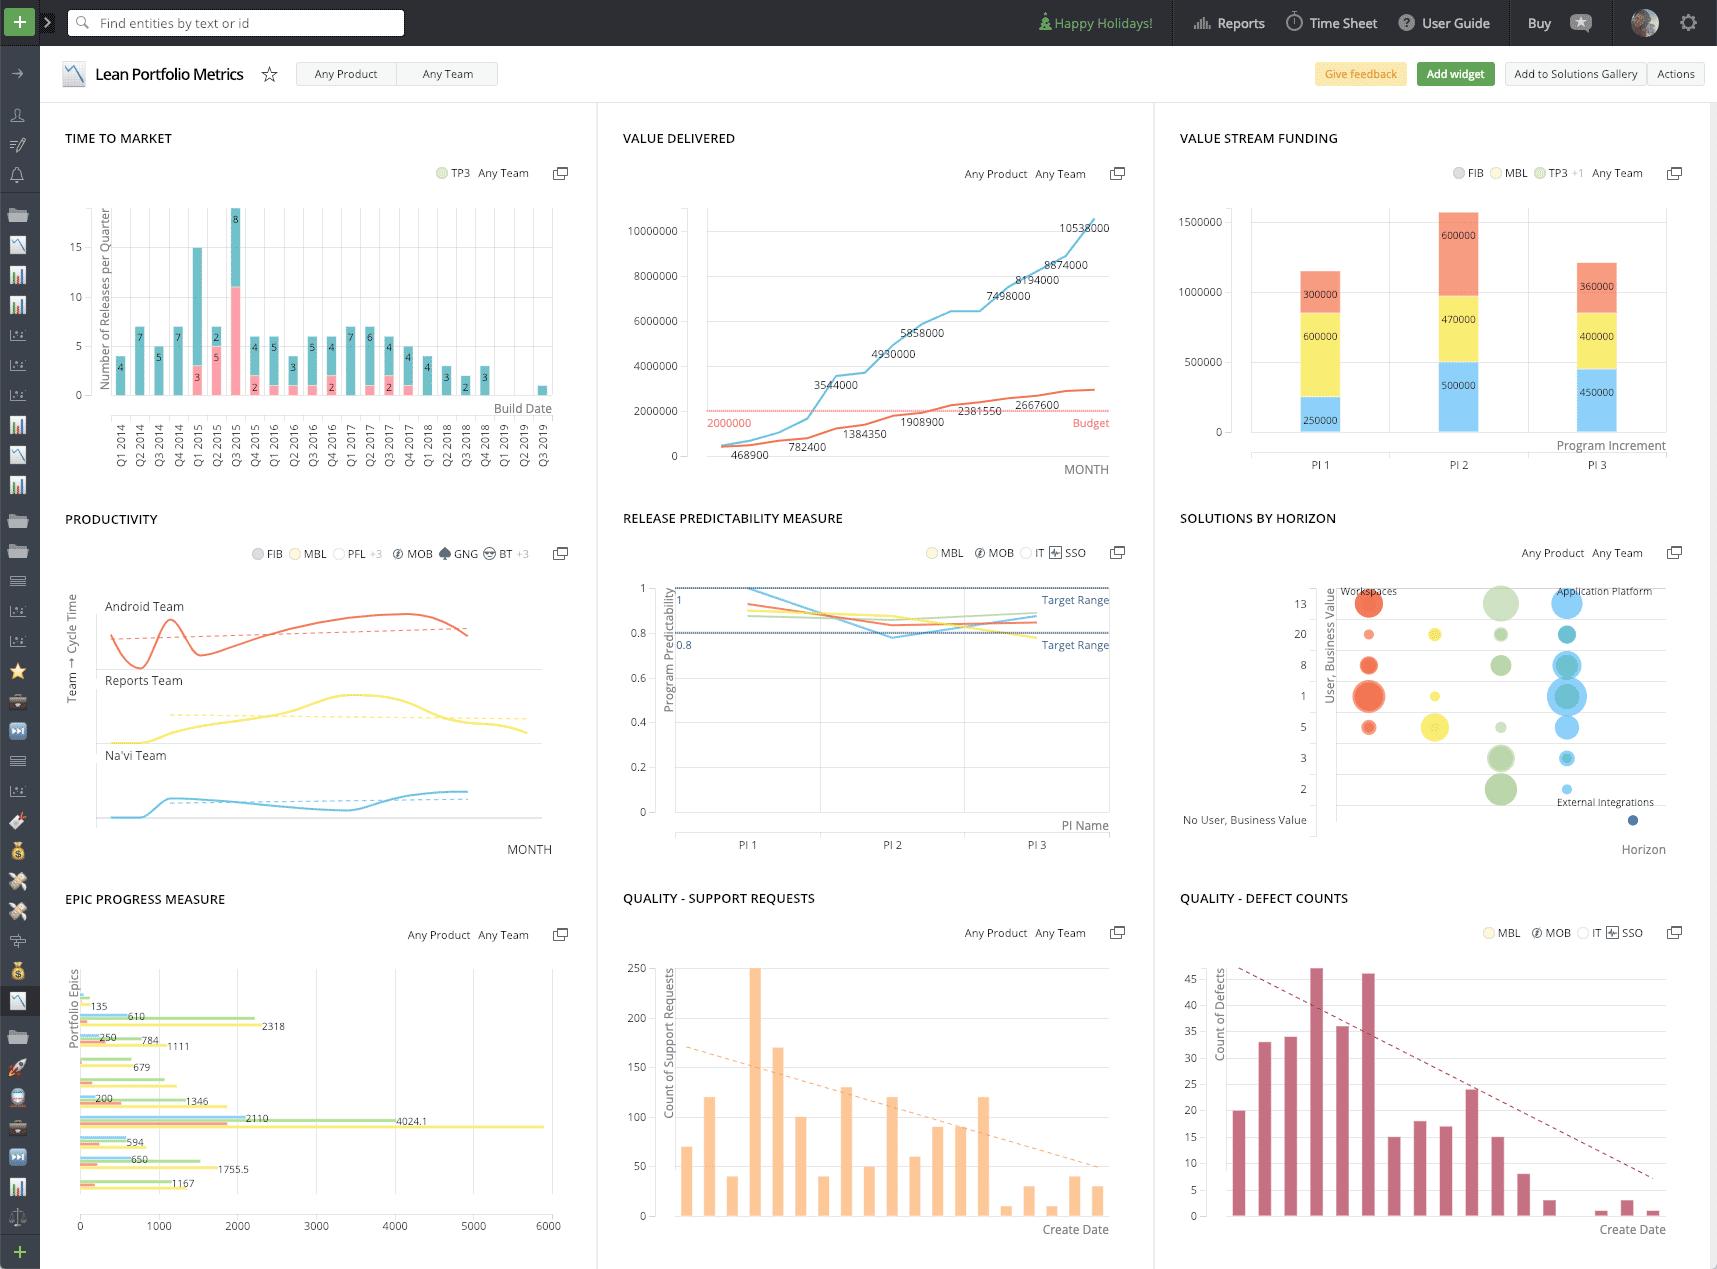 Targetprocess lean portfolio metrics